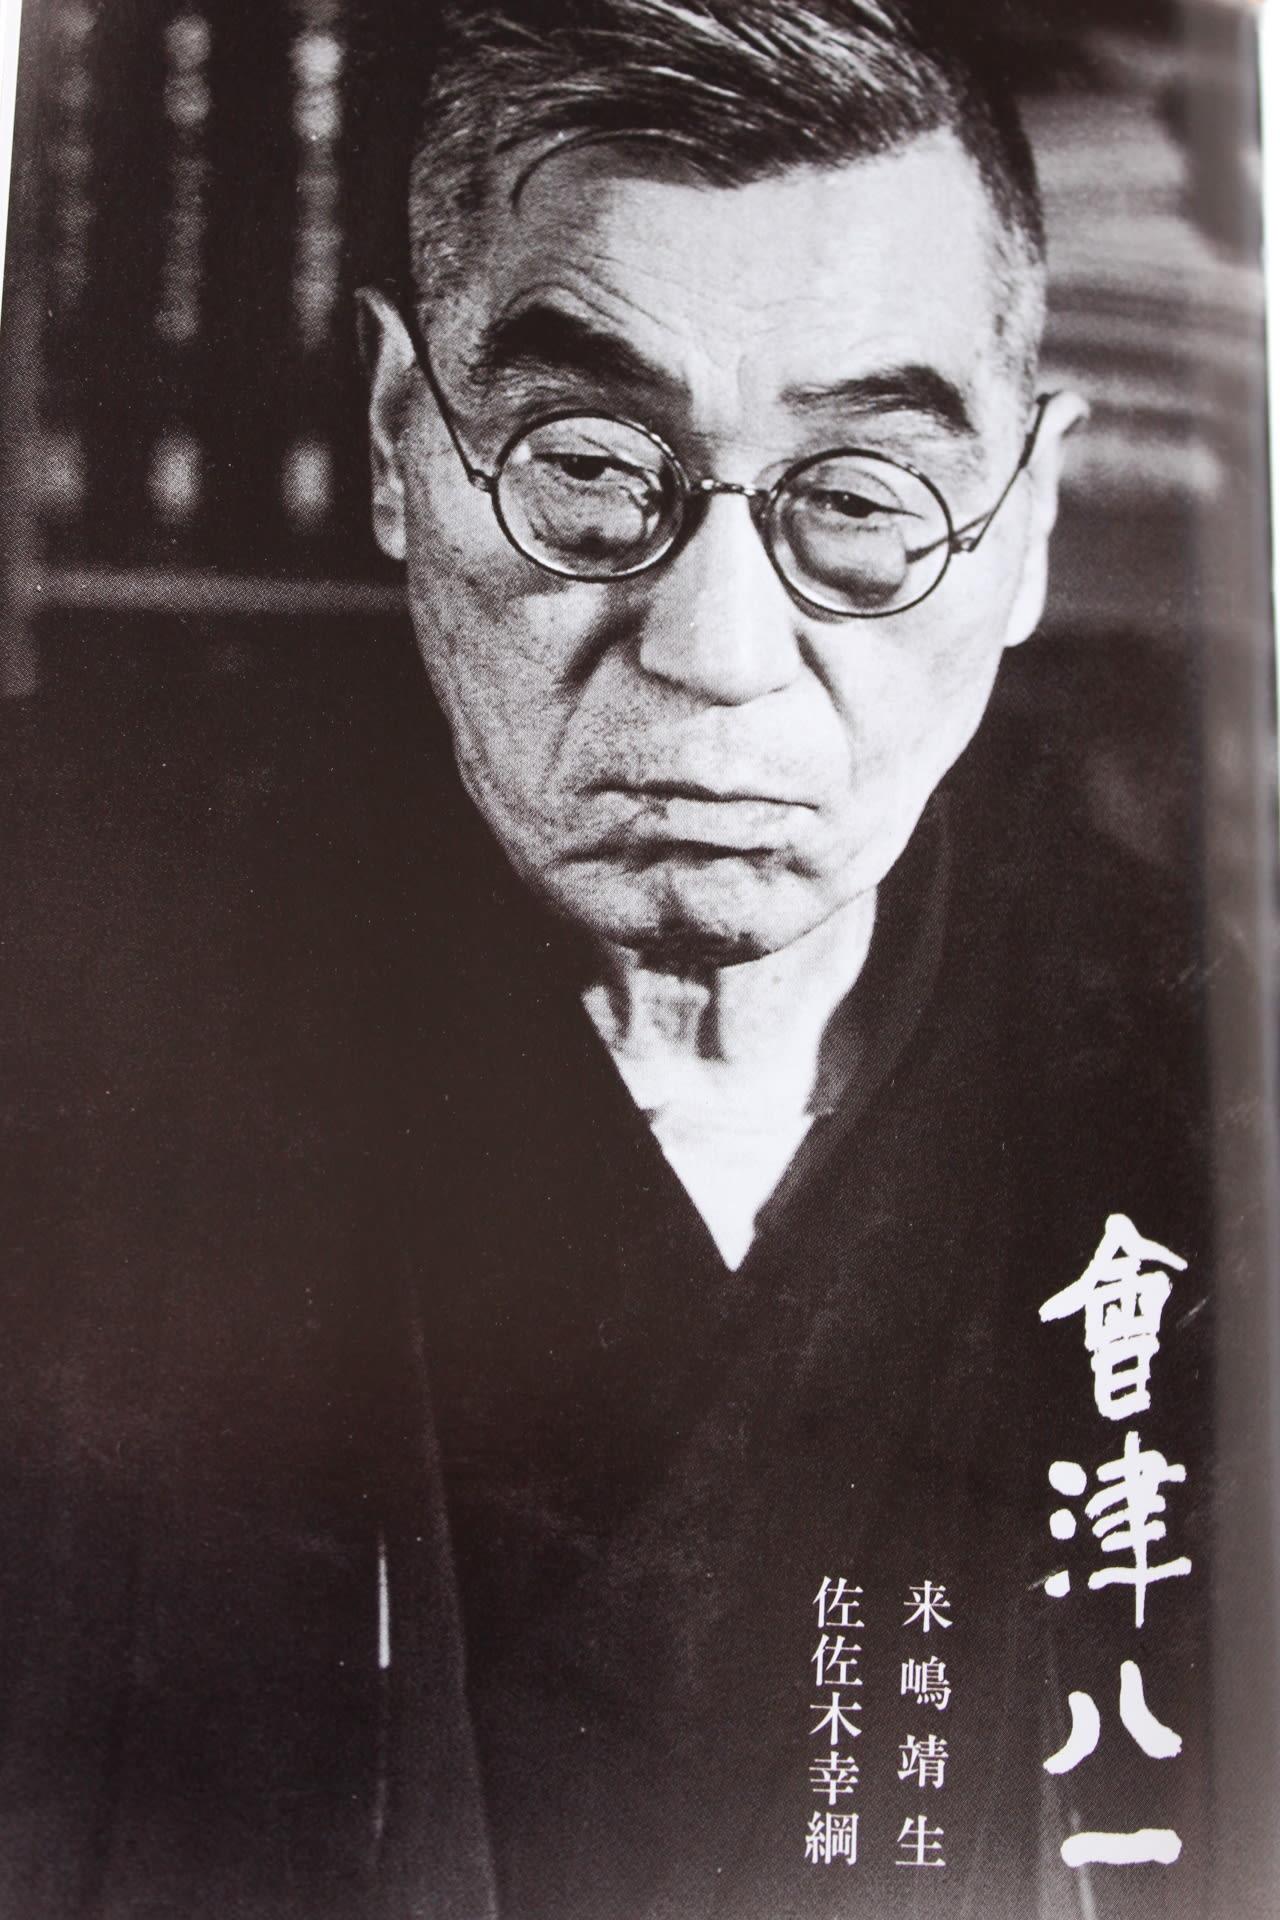 会津八一の画像 p1_37